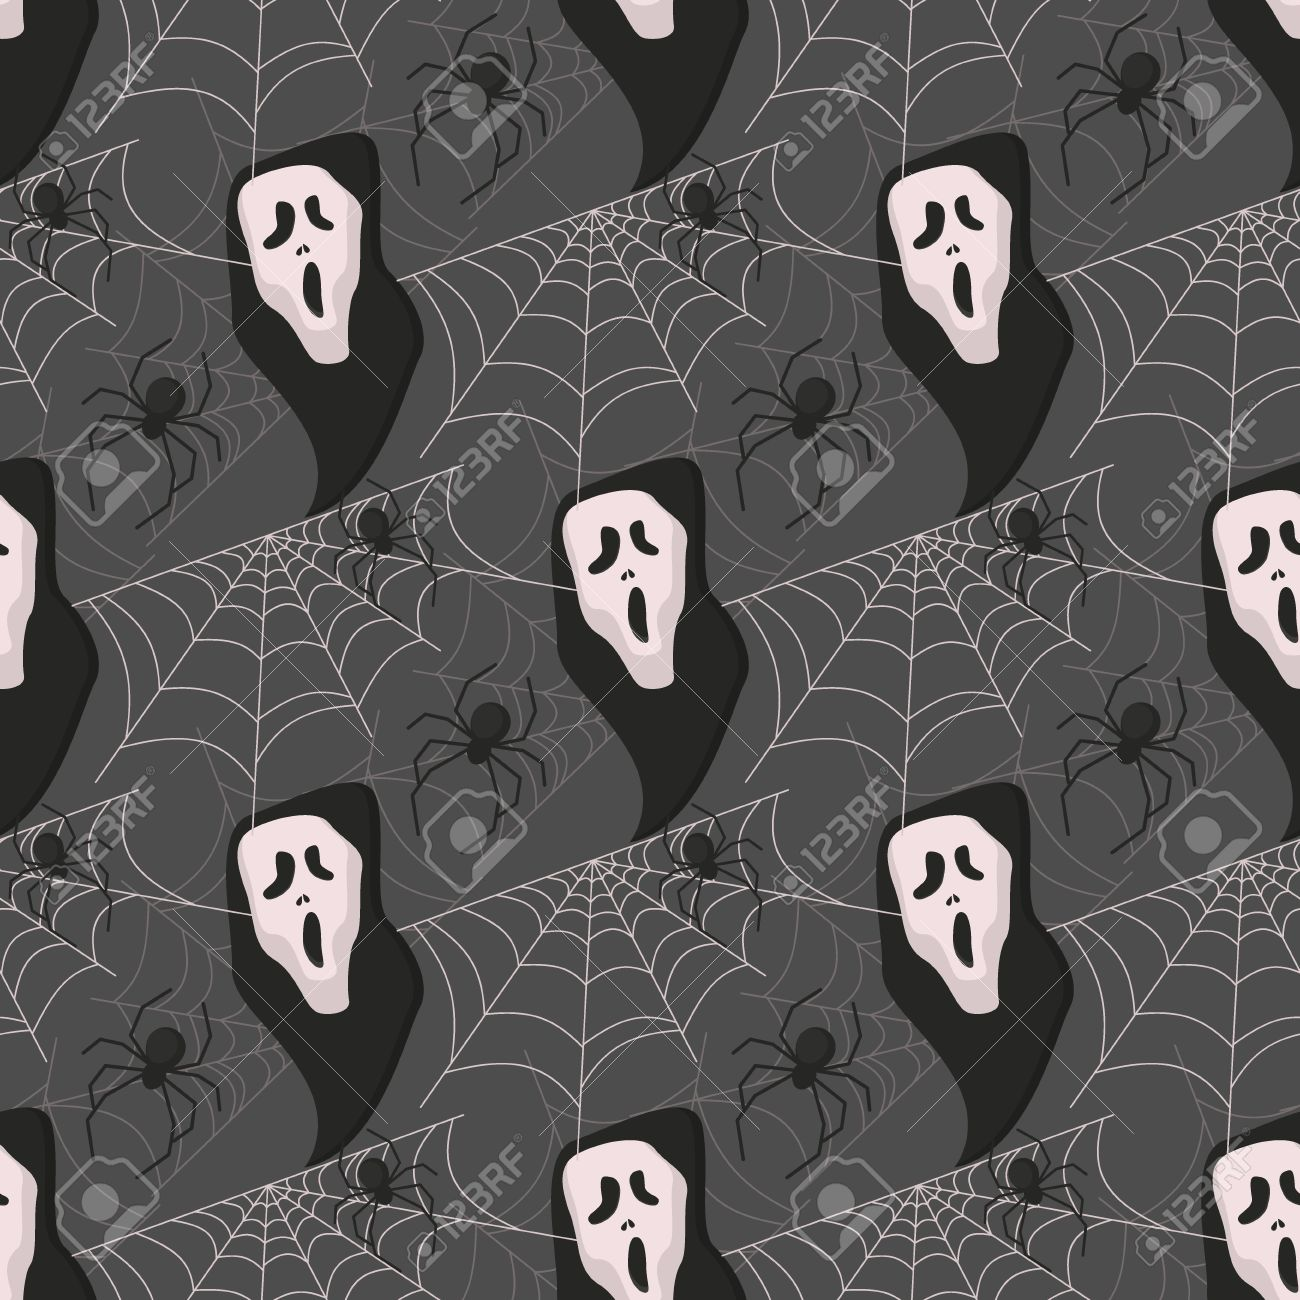 Halloween Spooky Wallpaper.Halloween Seamless Pattern Vector Background Holiday Horror Wallpaper